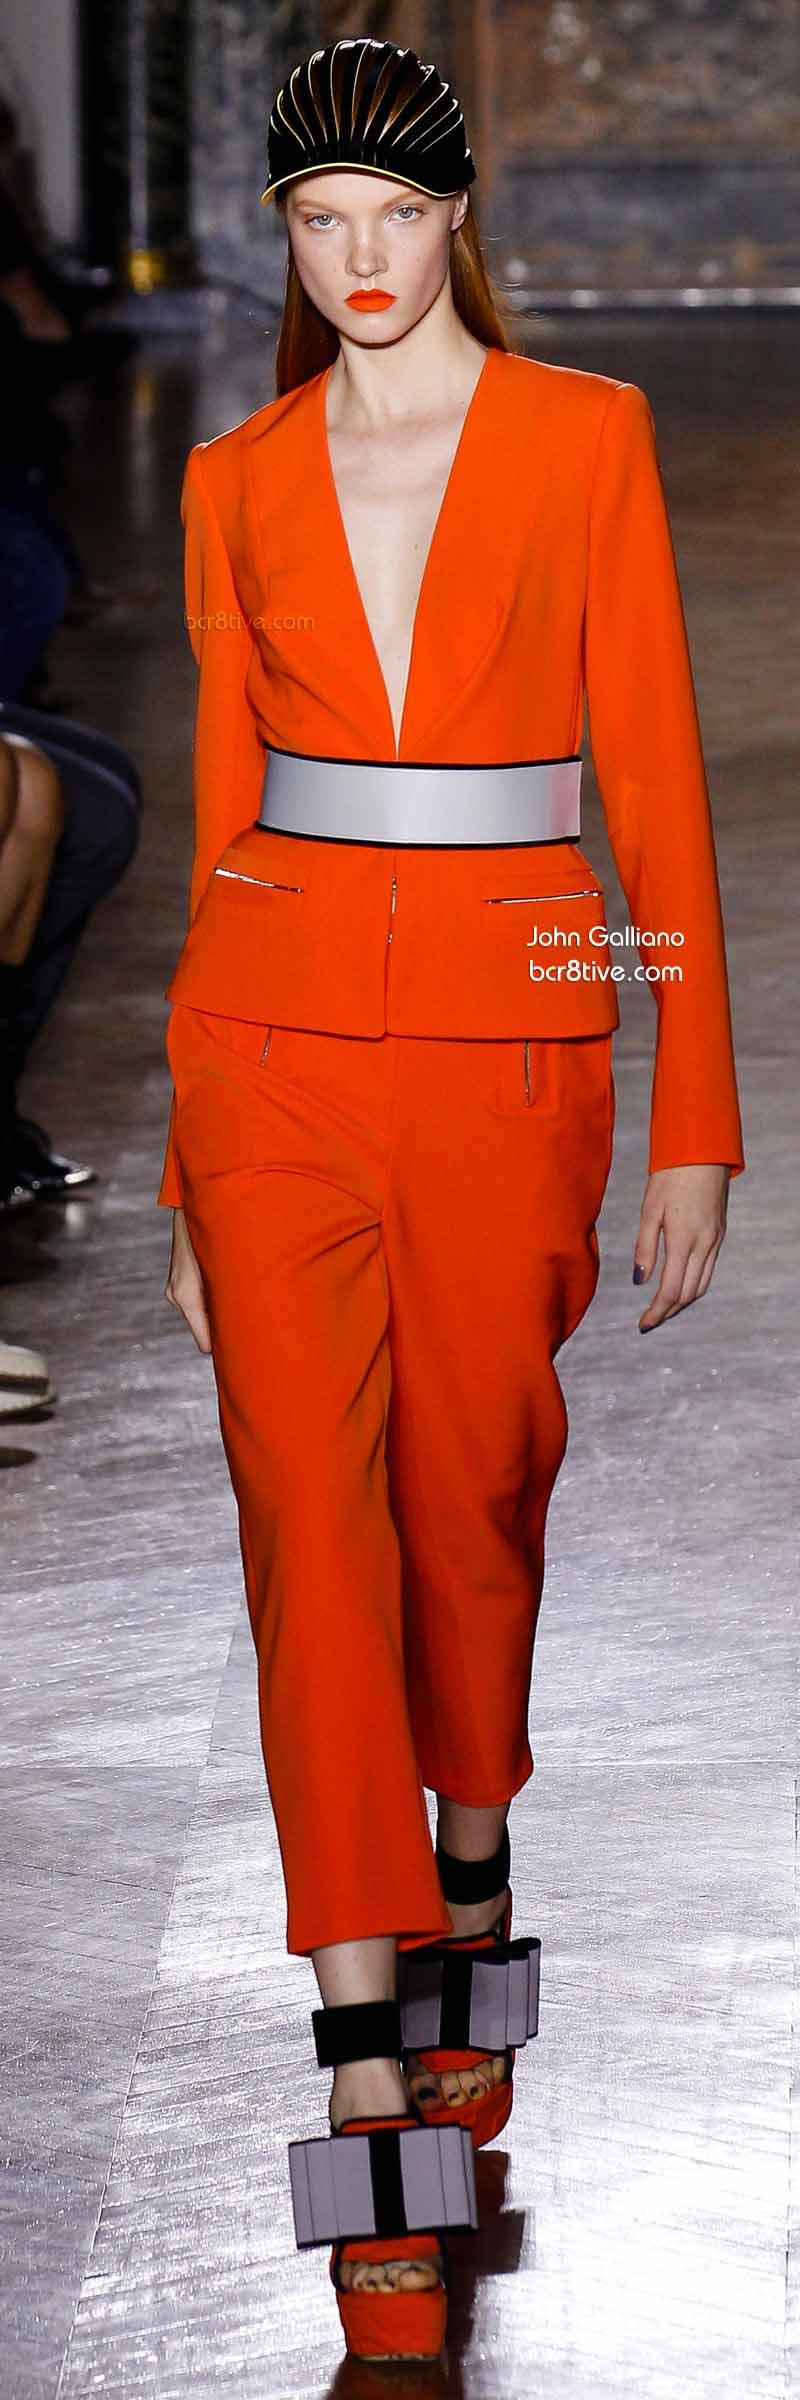 John Galliano - Glowing Orange Menswear Inspired Suit